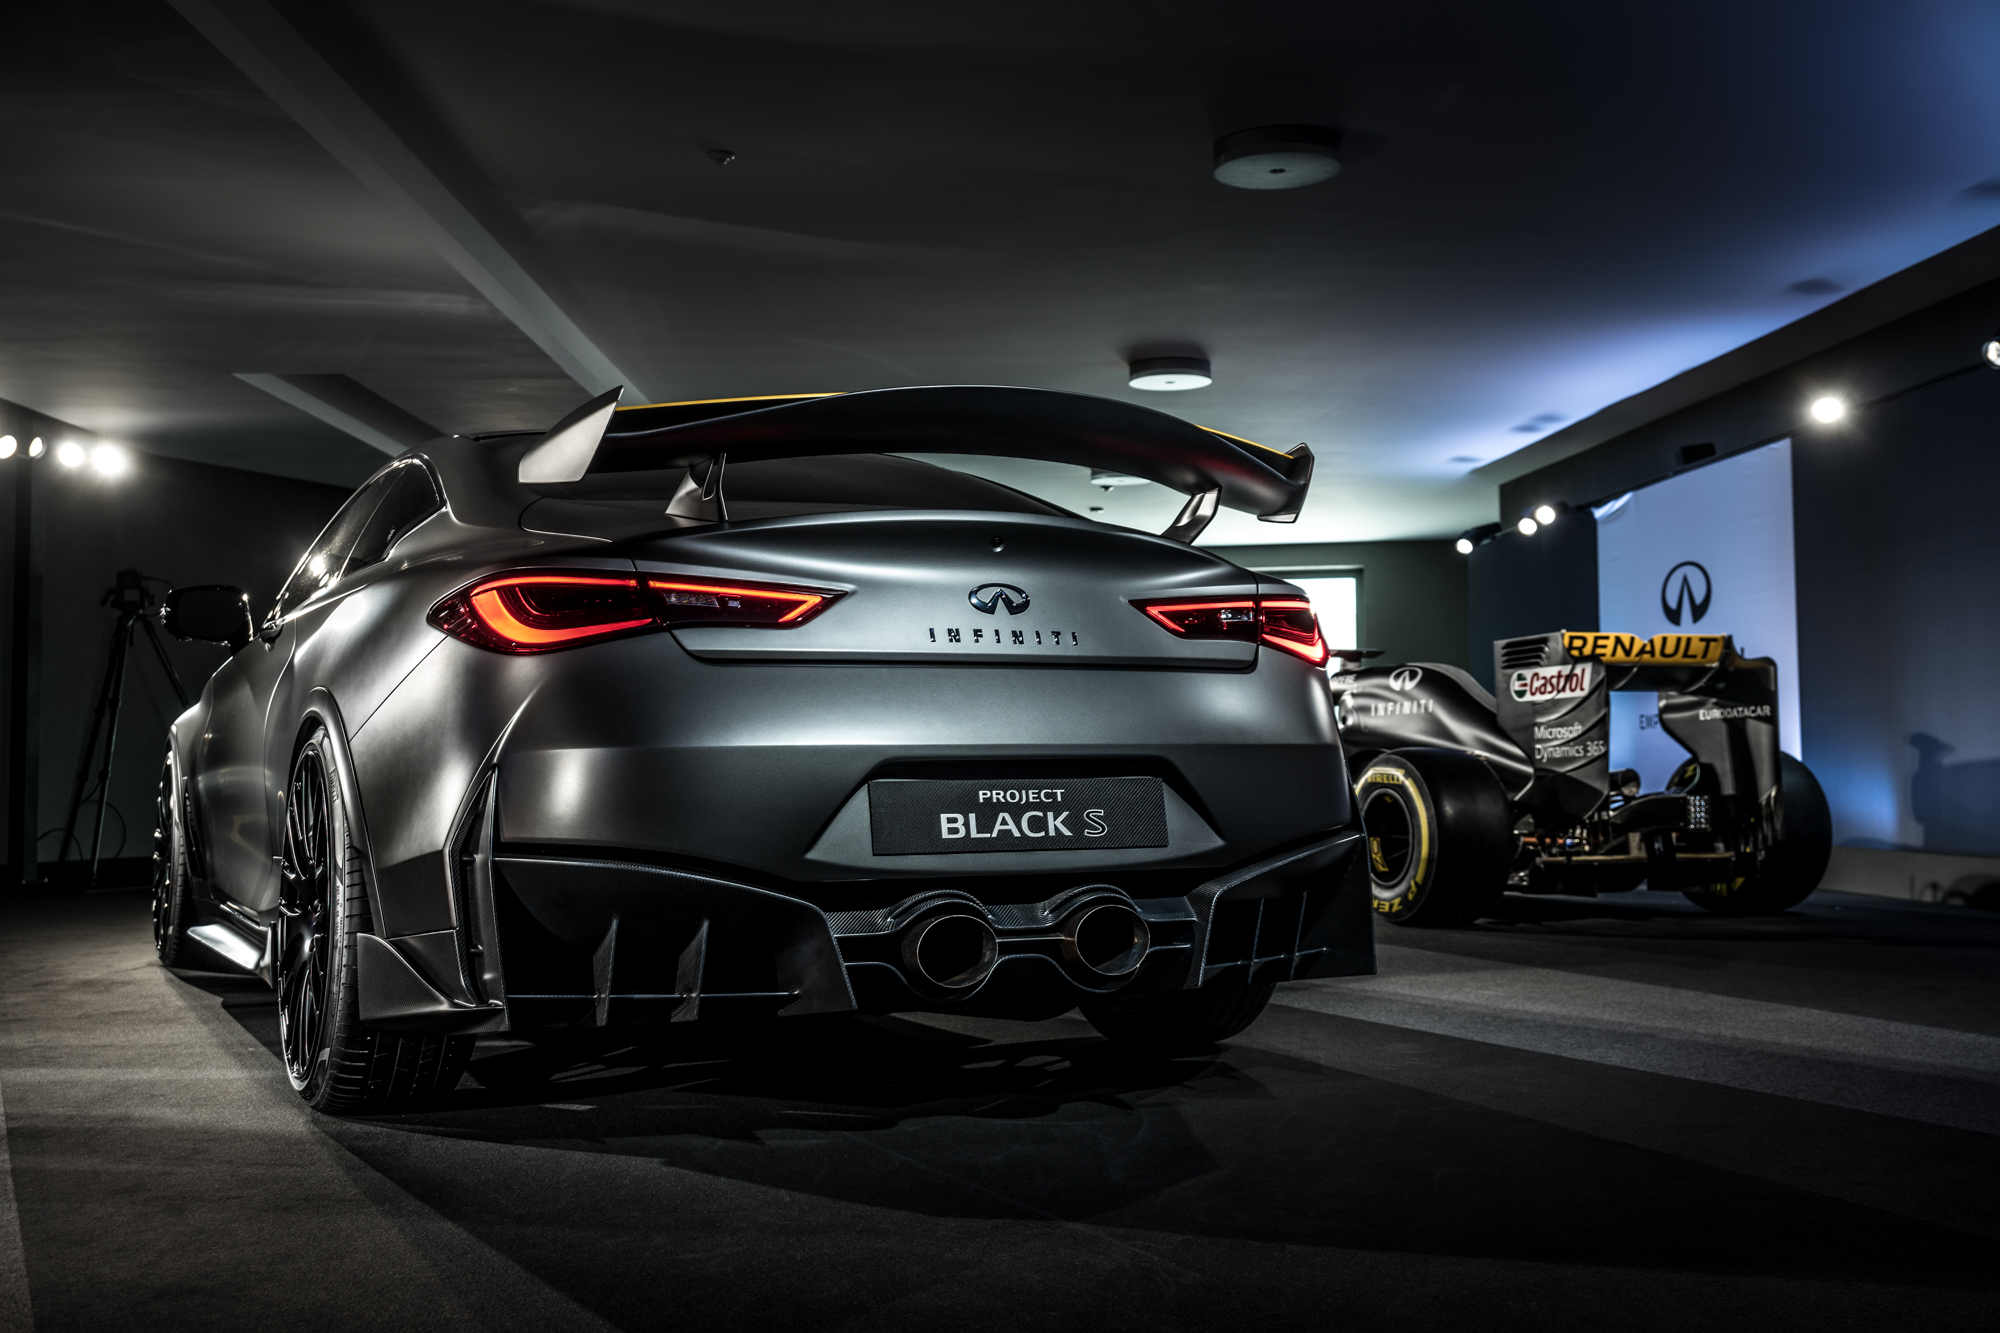 2018 bmw 5 series black